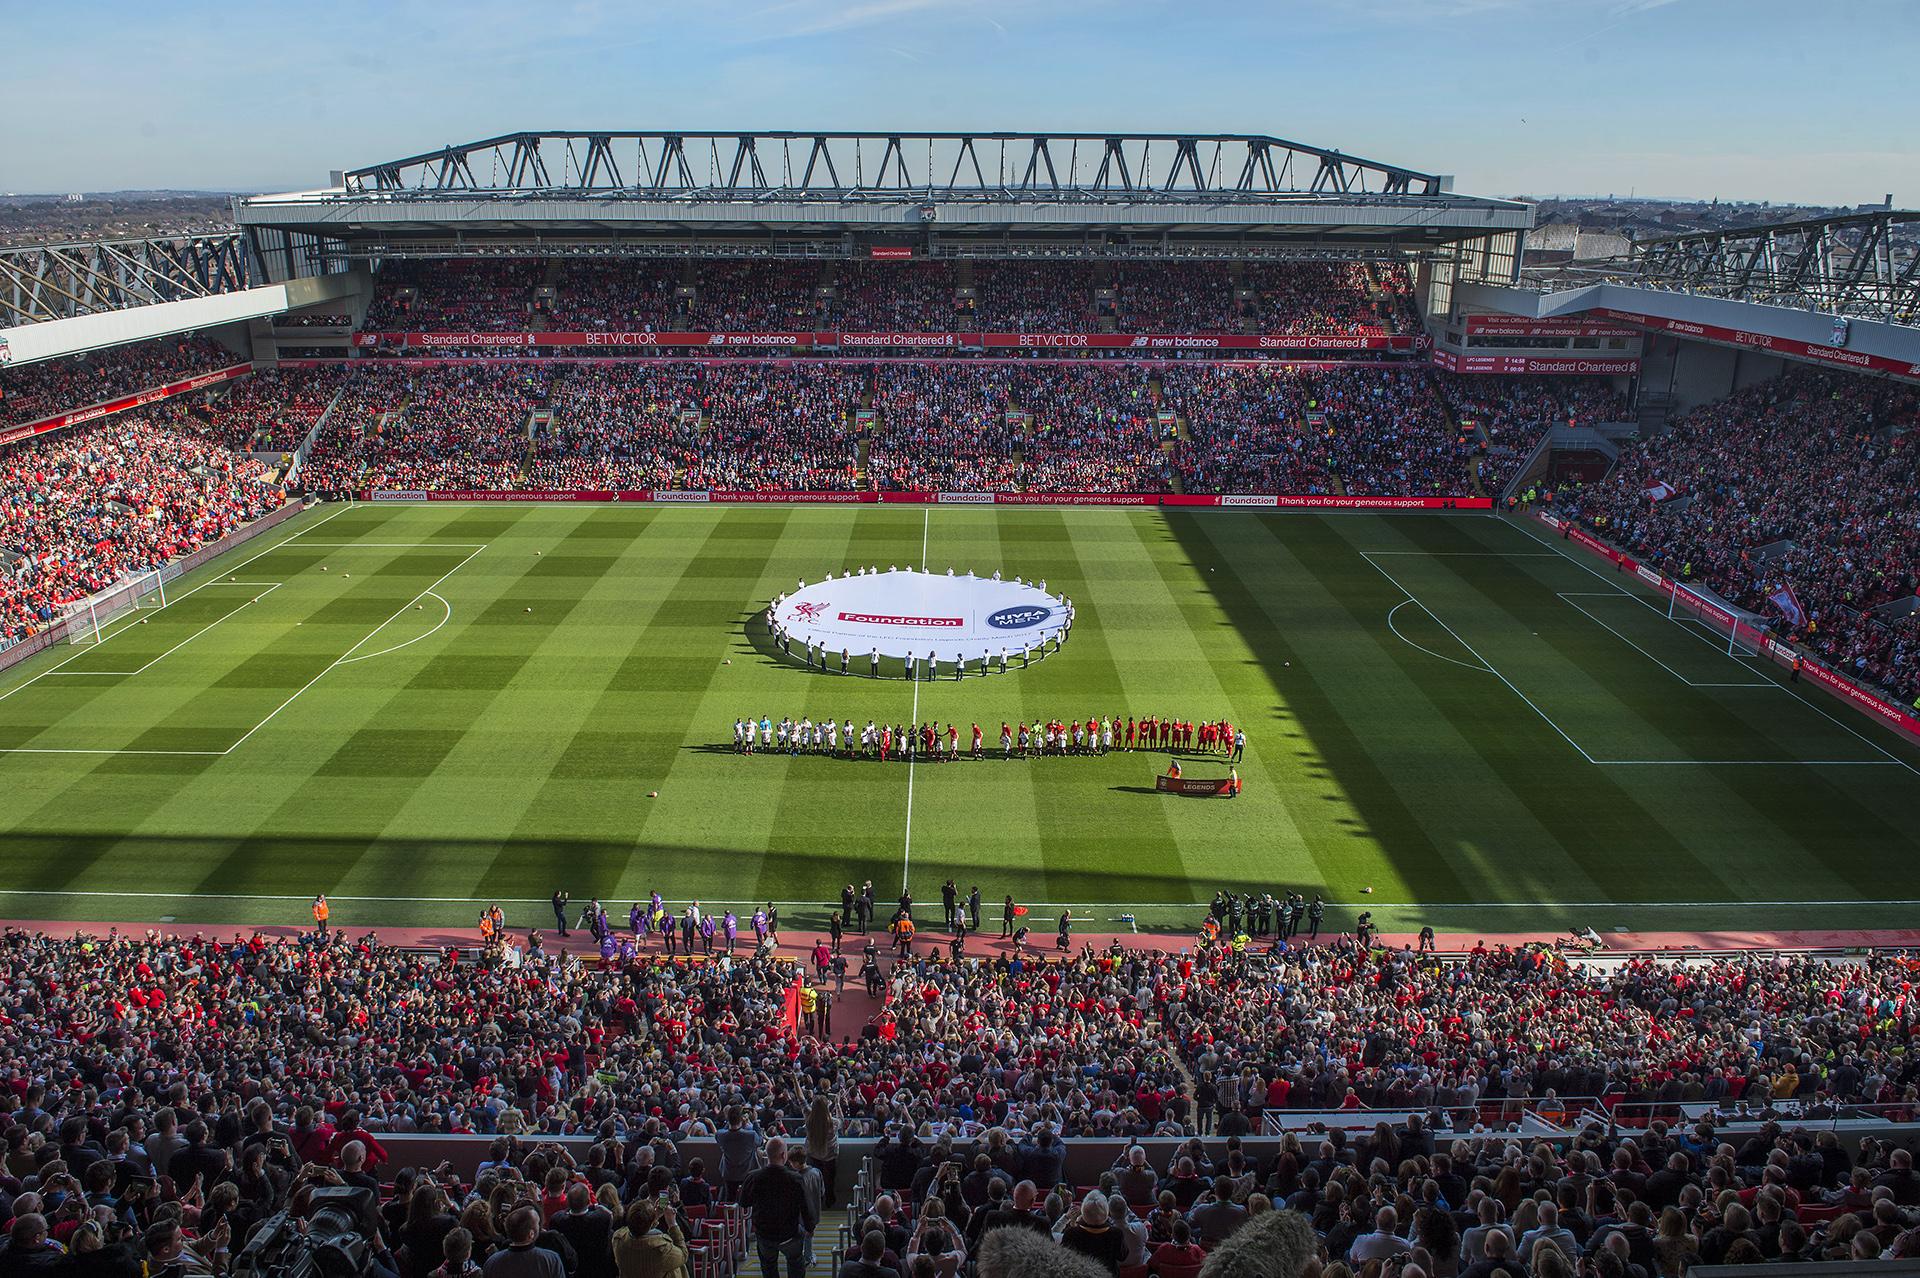 Liverpool FC vs Real Madrid Legends Anfield Liverpool Foundation x Nivea Men Liverpool Legenda vs Real Mardrid Legends.jpg